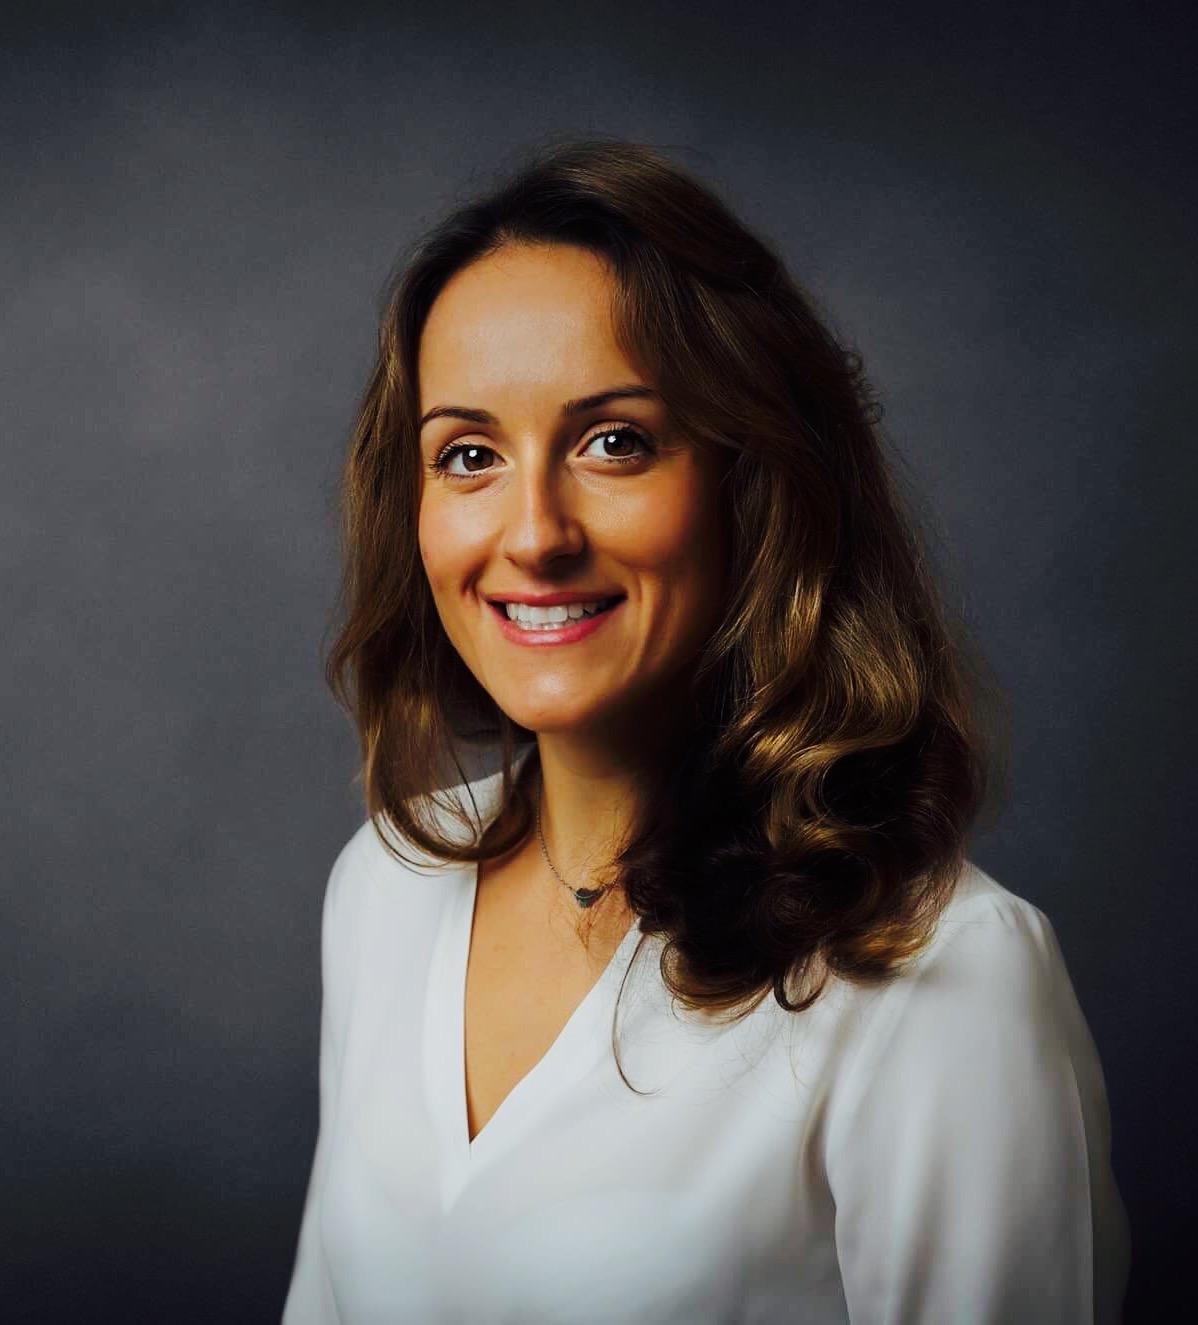 Helen Rivero